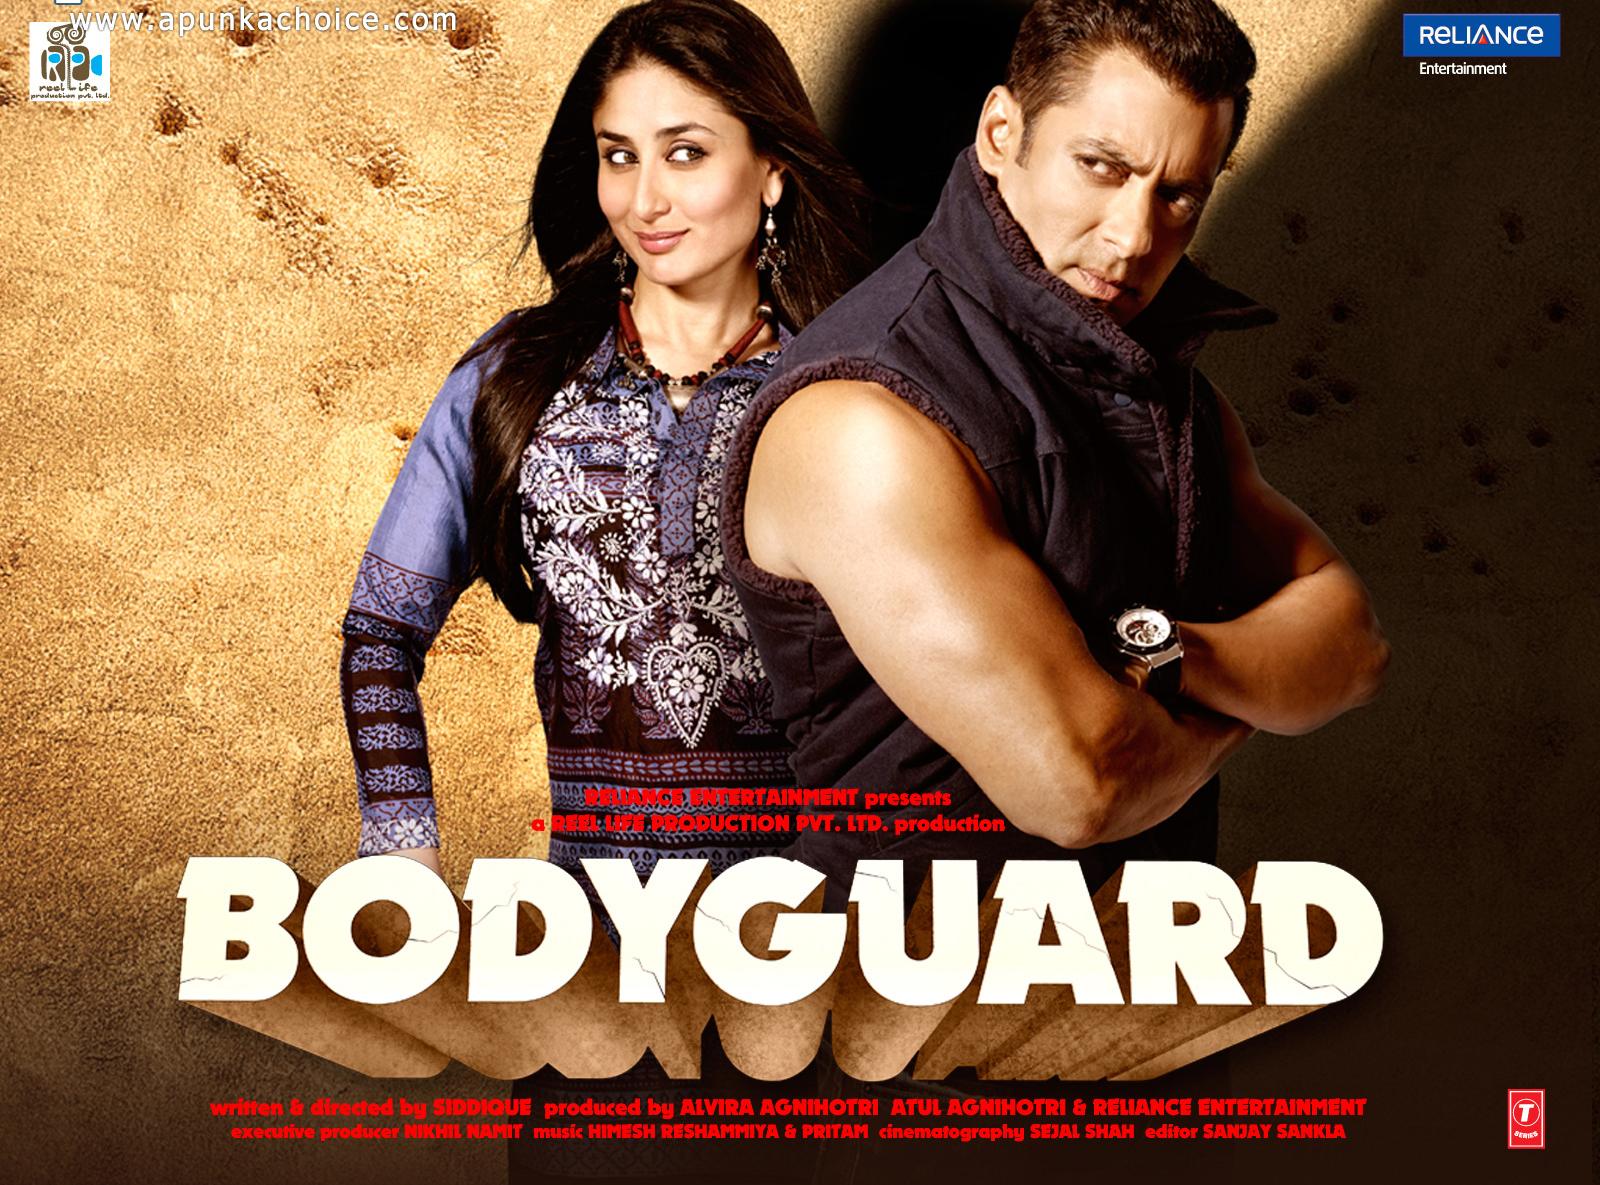 http://4.bp.blogspot.com/-_3A-VvK-Cw0/TlgEzUtA1EI/AAAAAAAAAQo/zROEePIvmS0/s1600/bodyguard-film-kareena1+%25285%2529.jpg